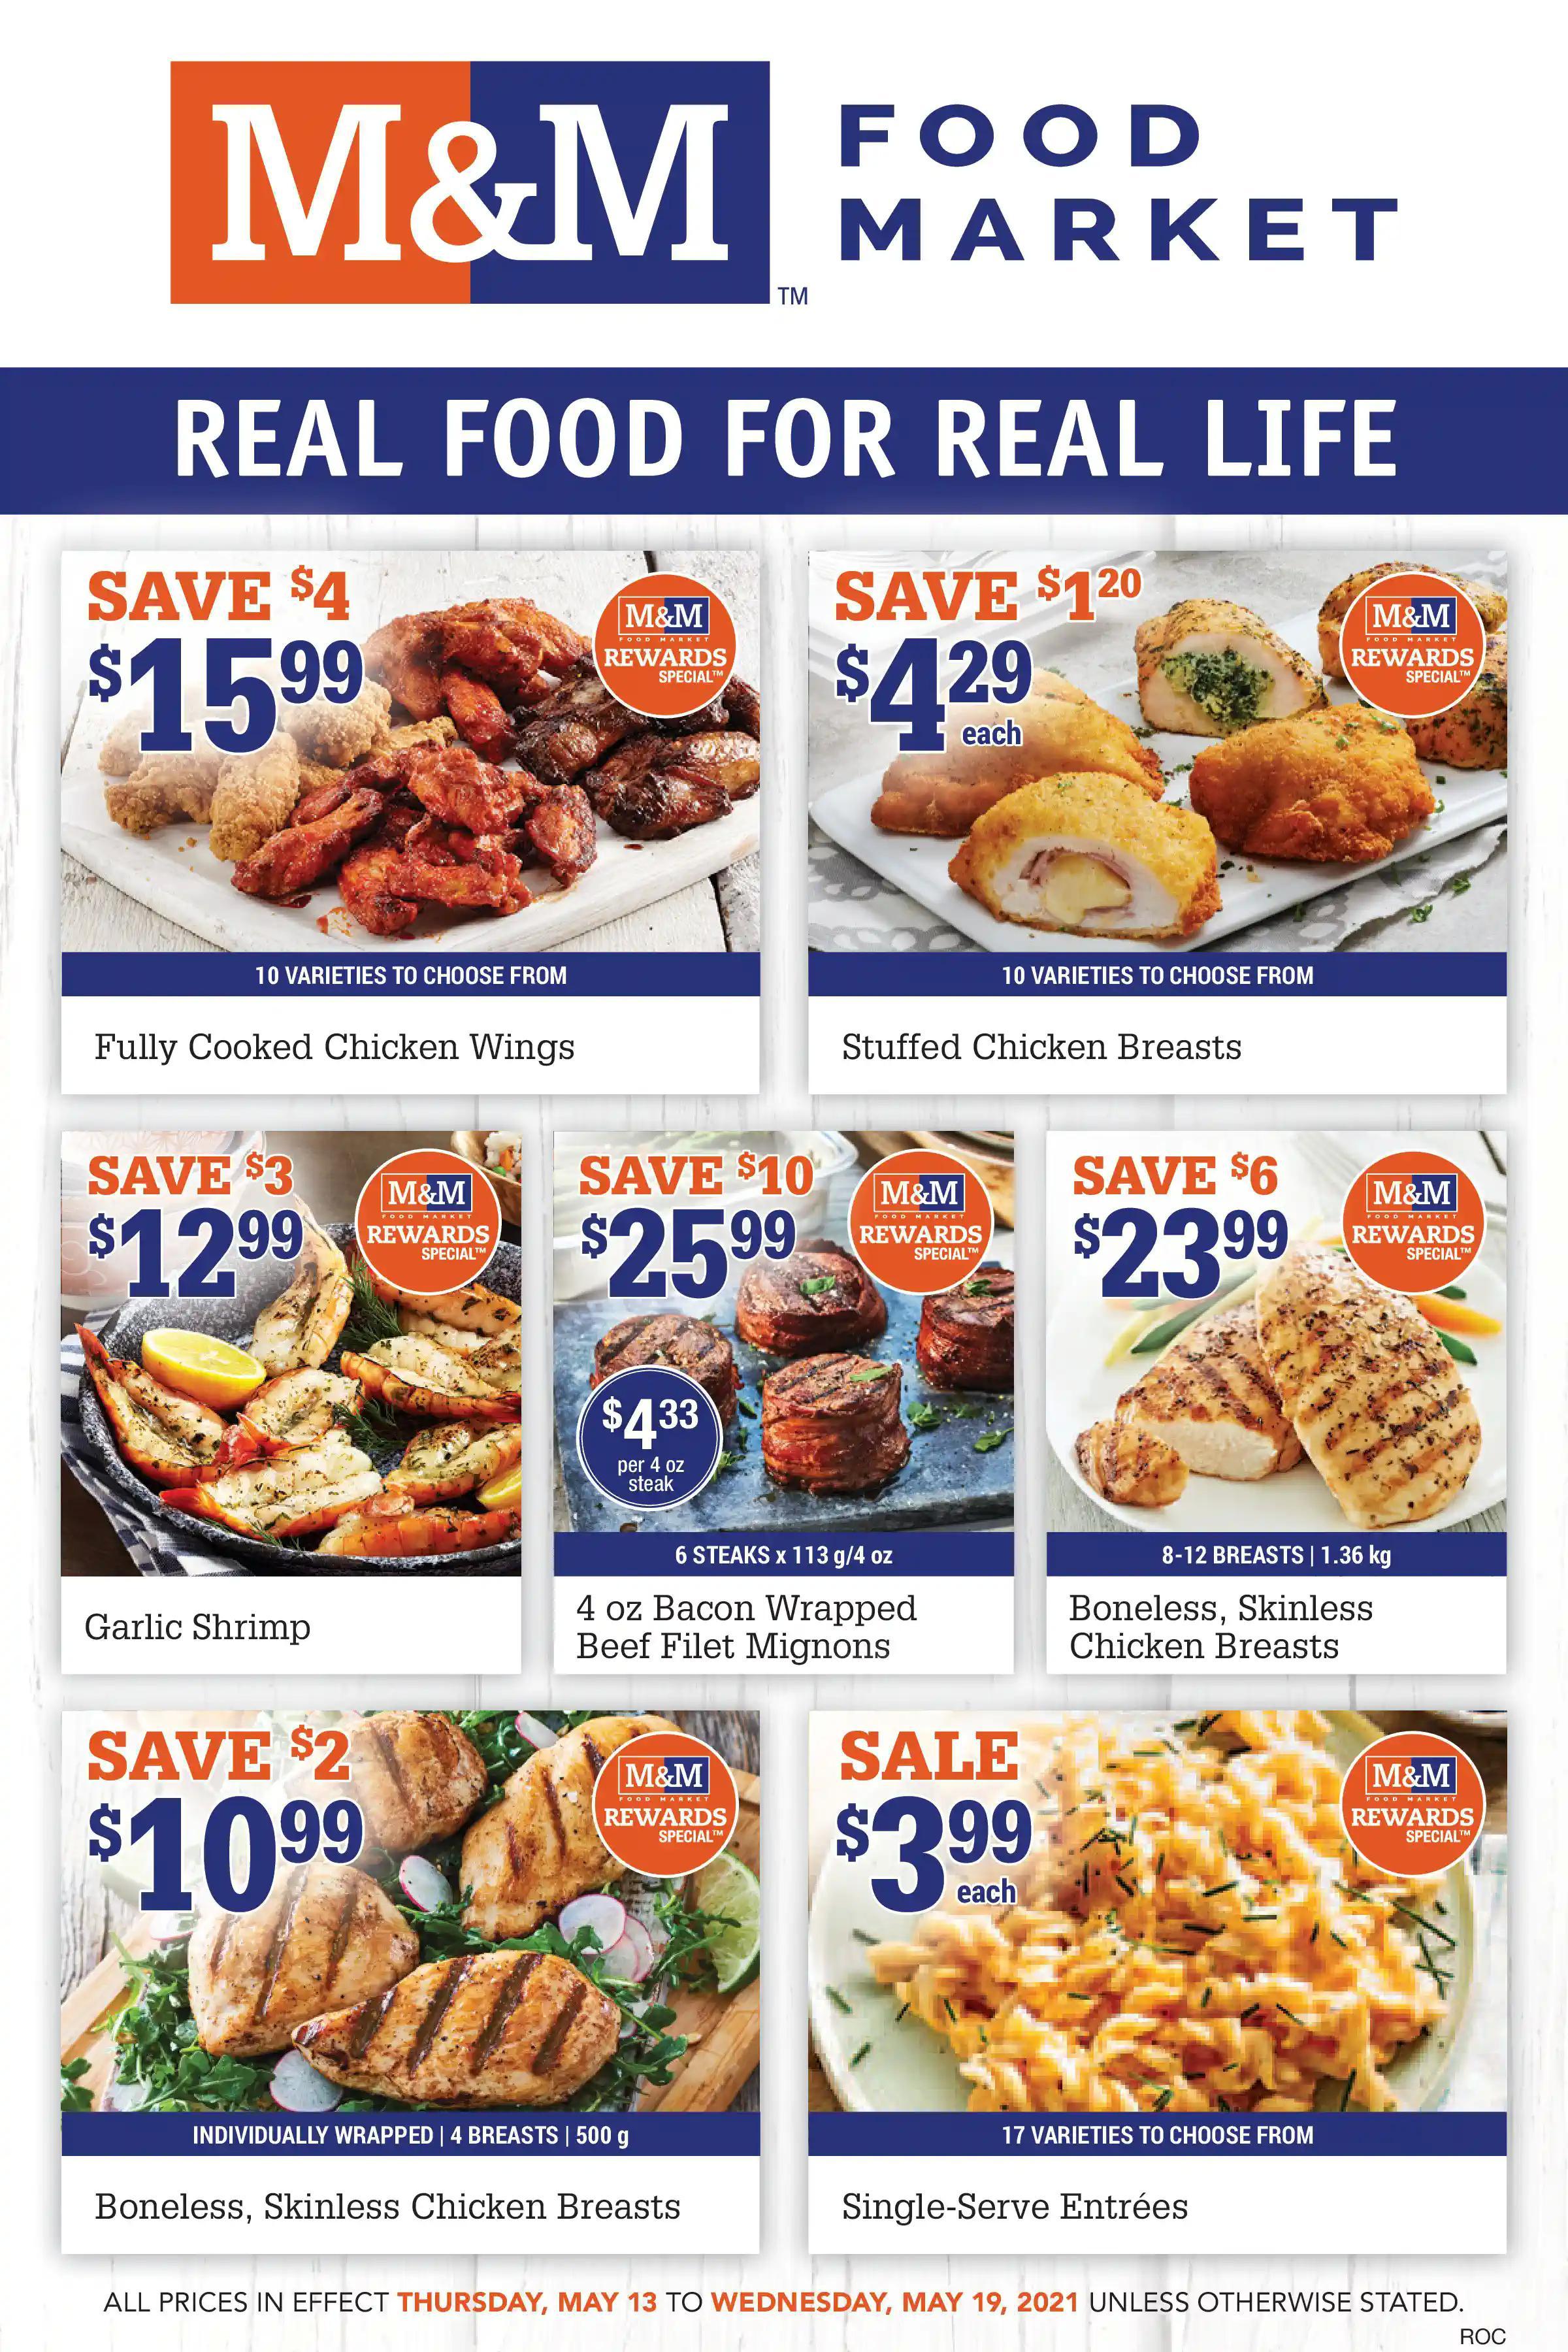 M&M Food Market - Weekly Flyer Specials